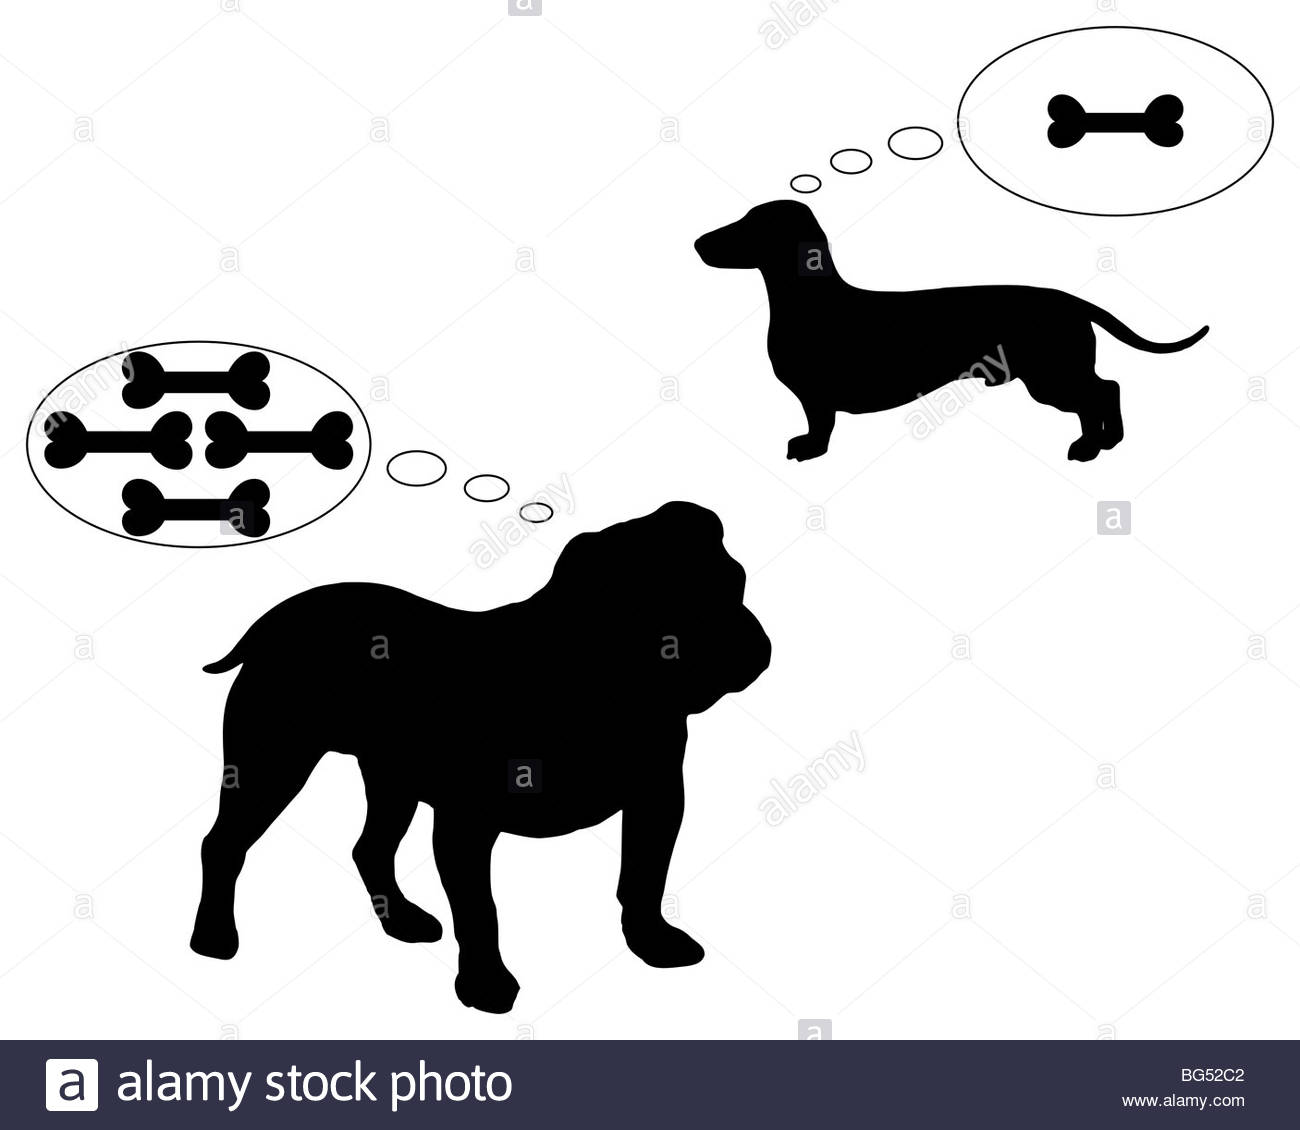 1300x1130 English Bulldog And Dachshund Dream Of Bones Stock Photo, Royalty